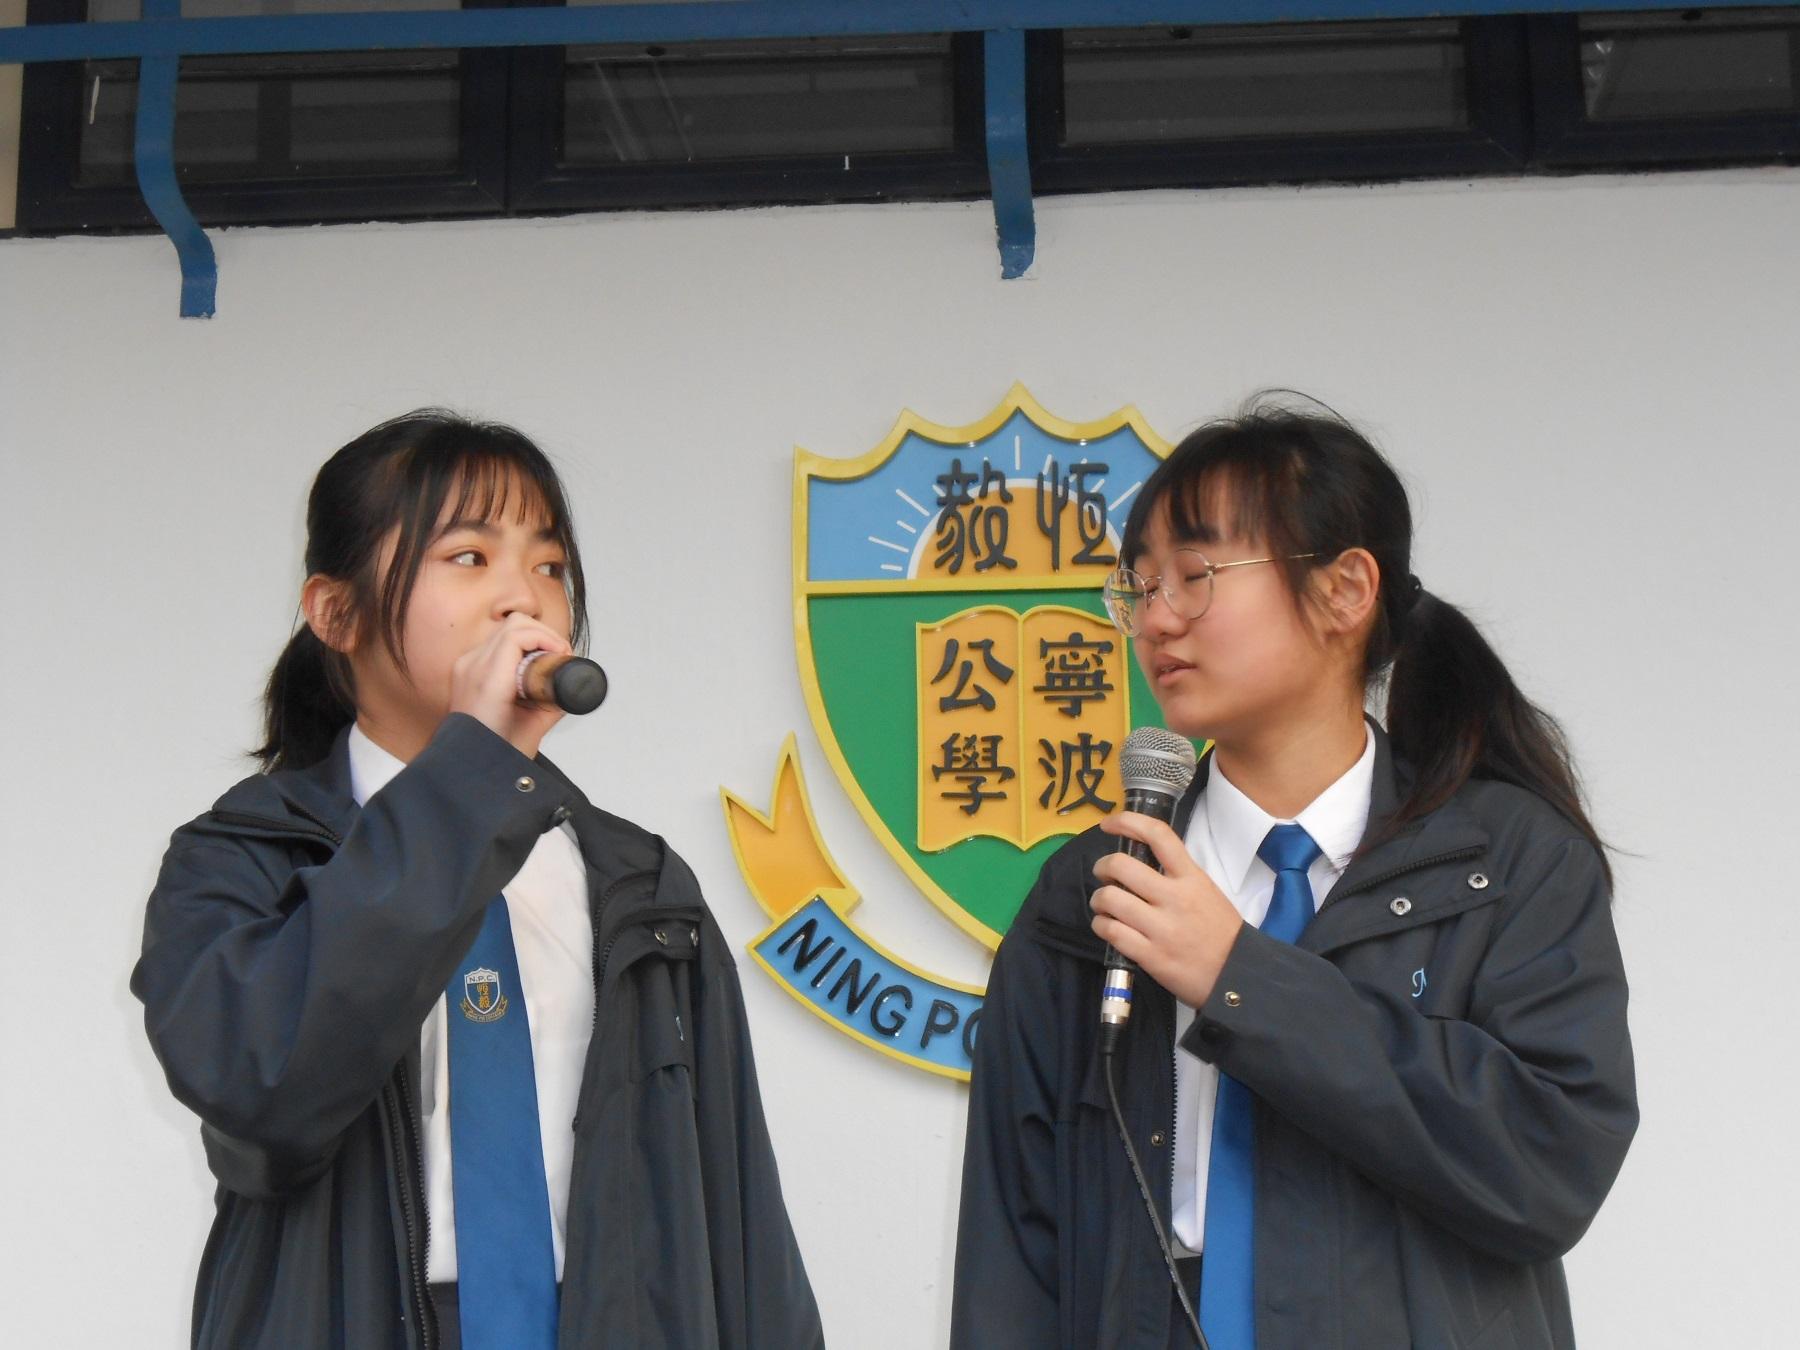 http://npc.edu.hk/sites/default/files/dscn9771.jpg